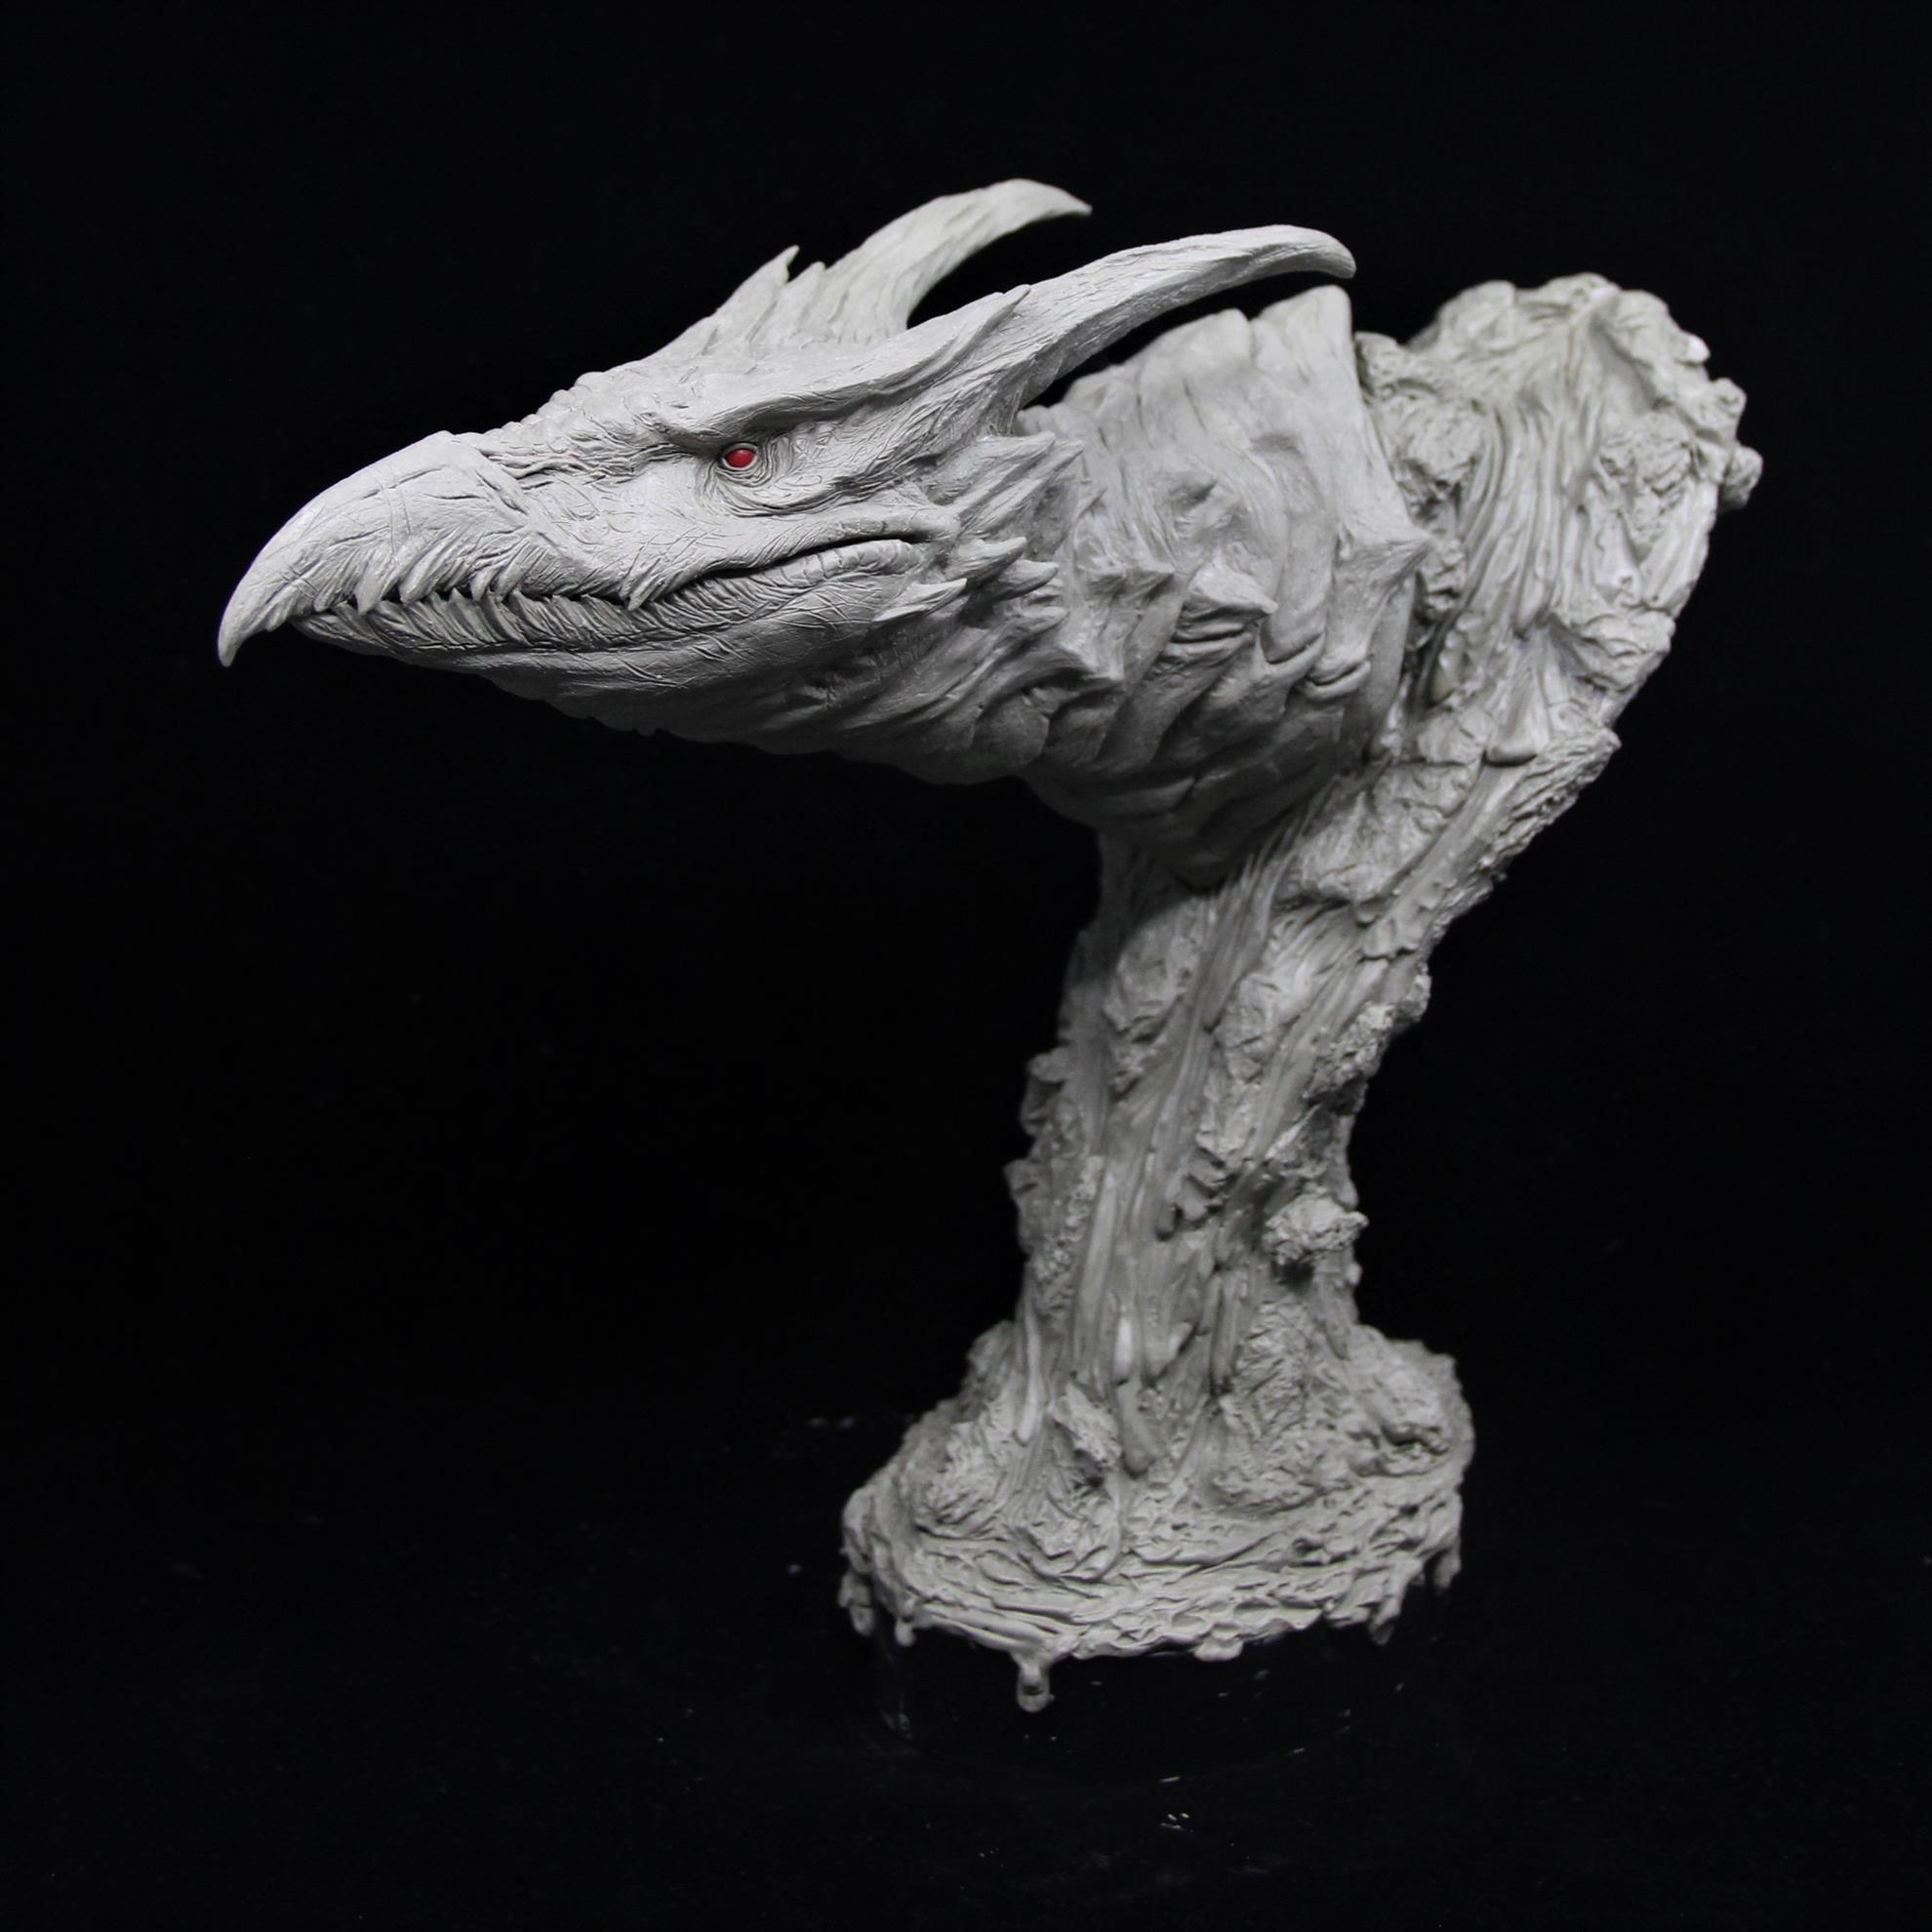 #Monster #kaijū  #Godzilla #ゴジラ #ラドン #Rodan